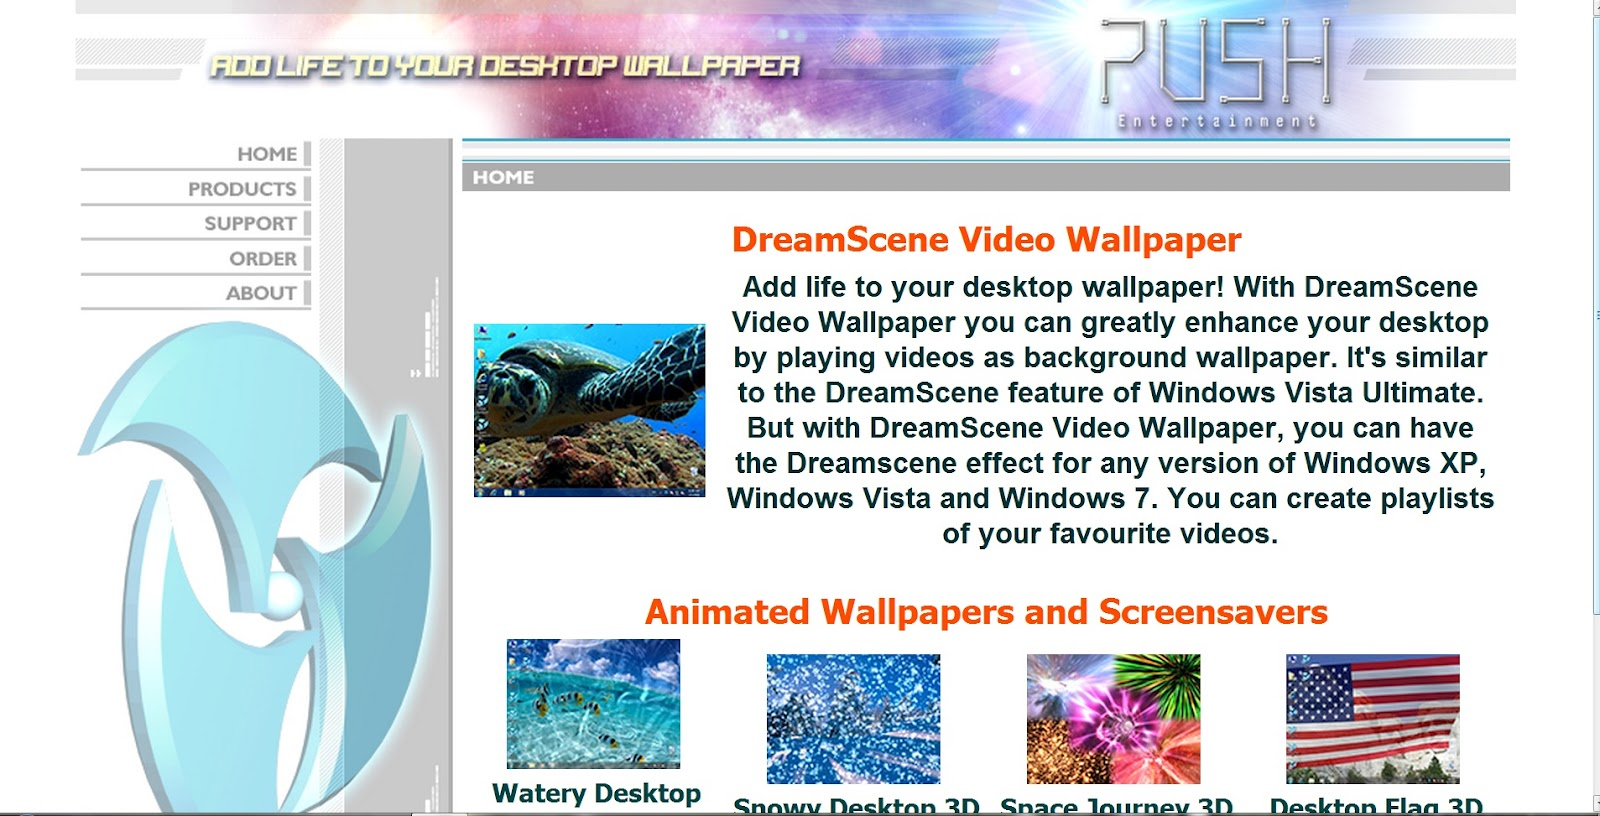 Pc Apps] PUSHEntertainmentDreamSceneVideoWallpaper V223 1600x816